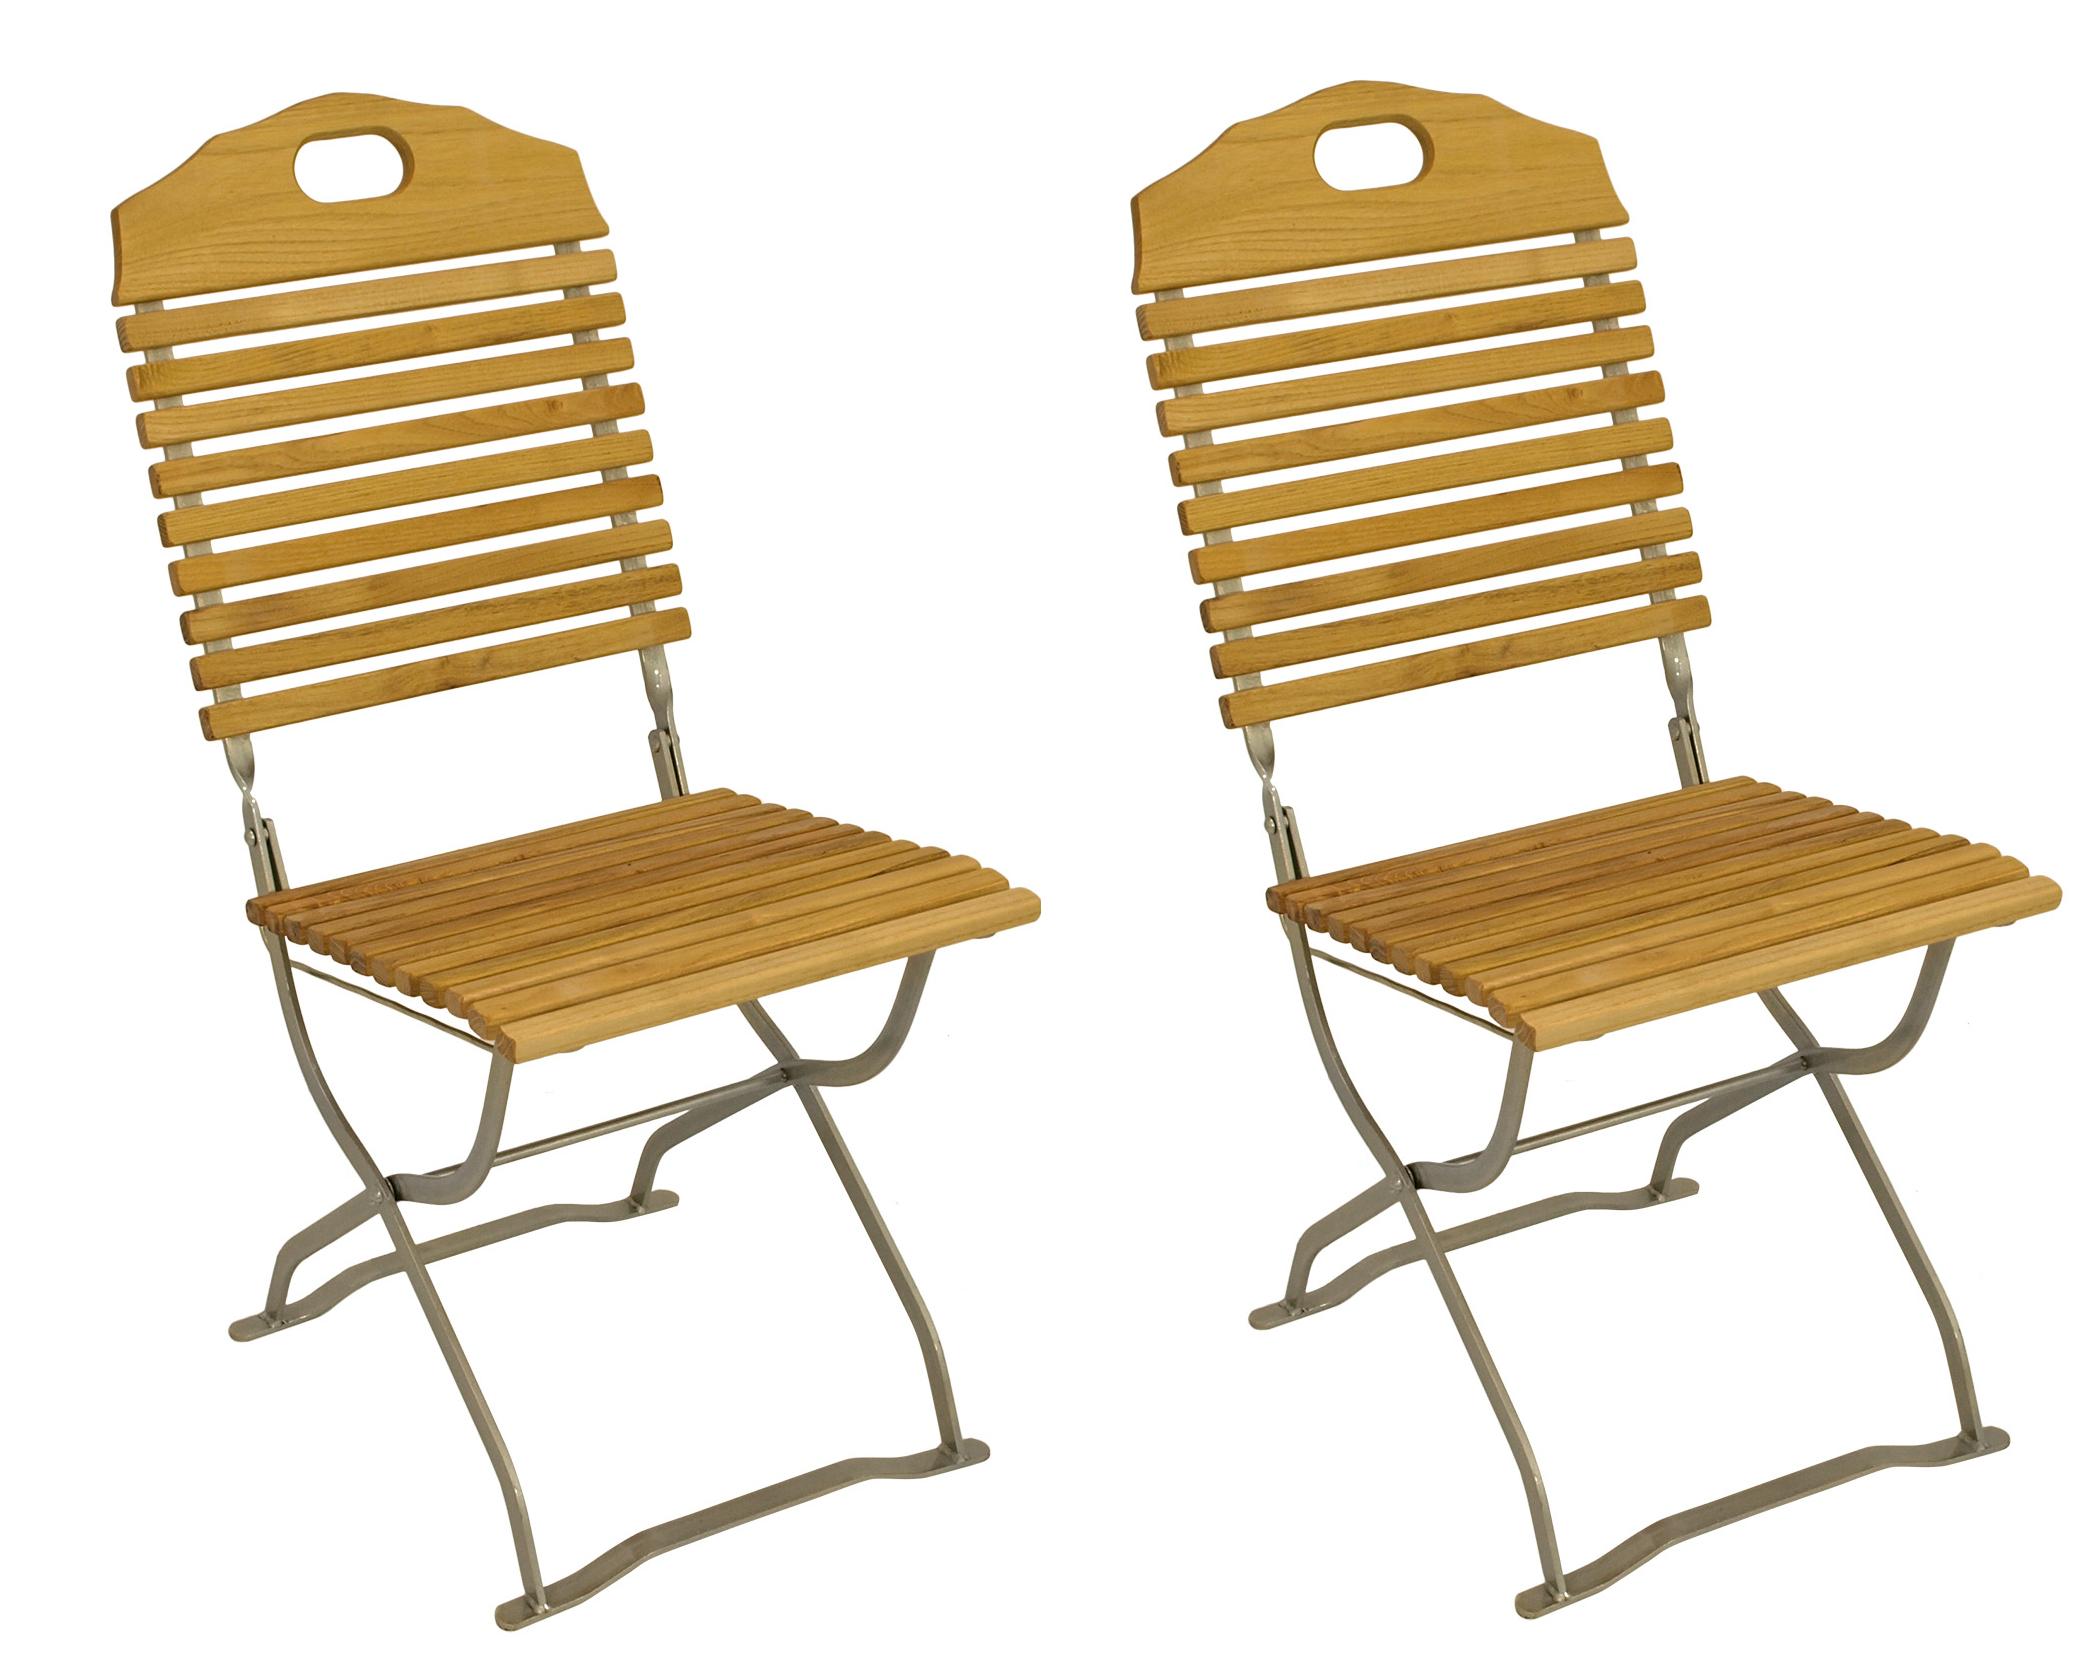 klappstuhl biergartenstuhl kurgarten bad t lz stahl verzinkt robinie 2 wahl ebay. Black Bedroom Furniture Sets. Home Design Ideas